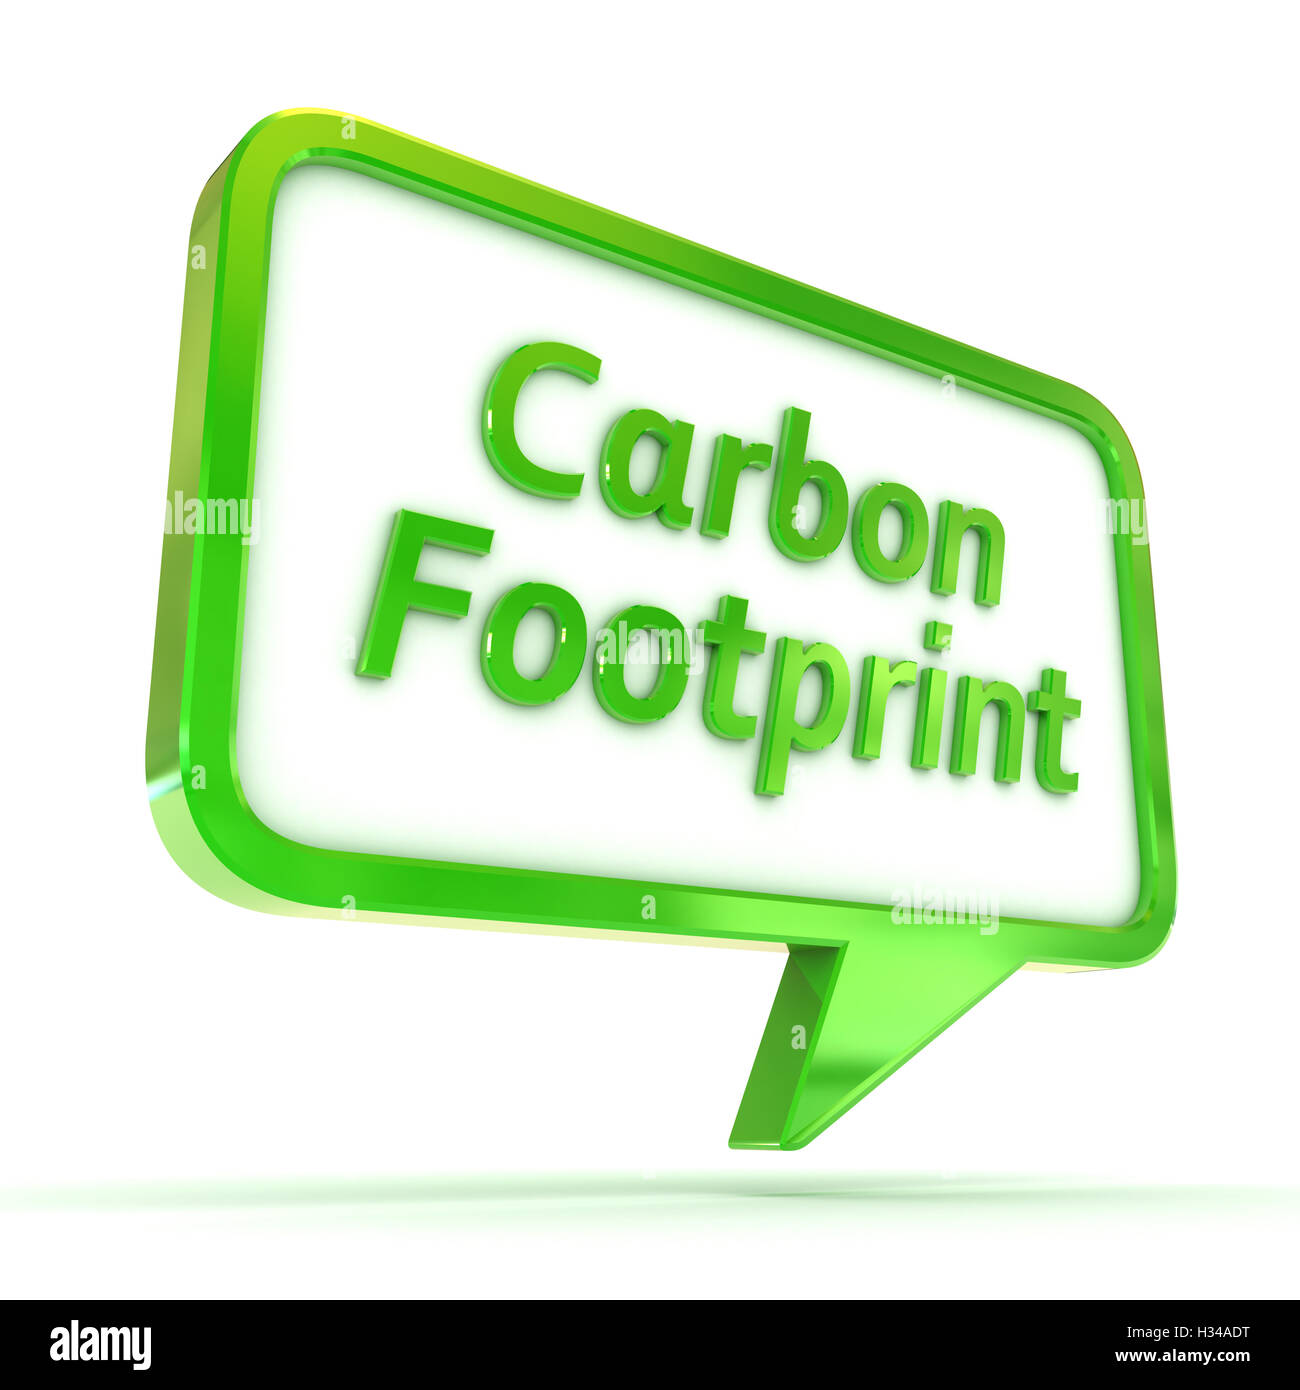 Discurso de burbuja de Carbono Imagen De Stock